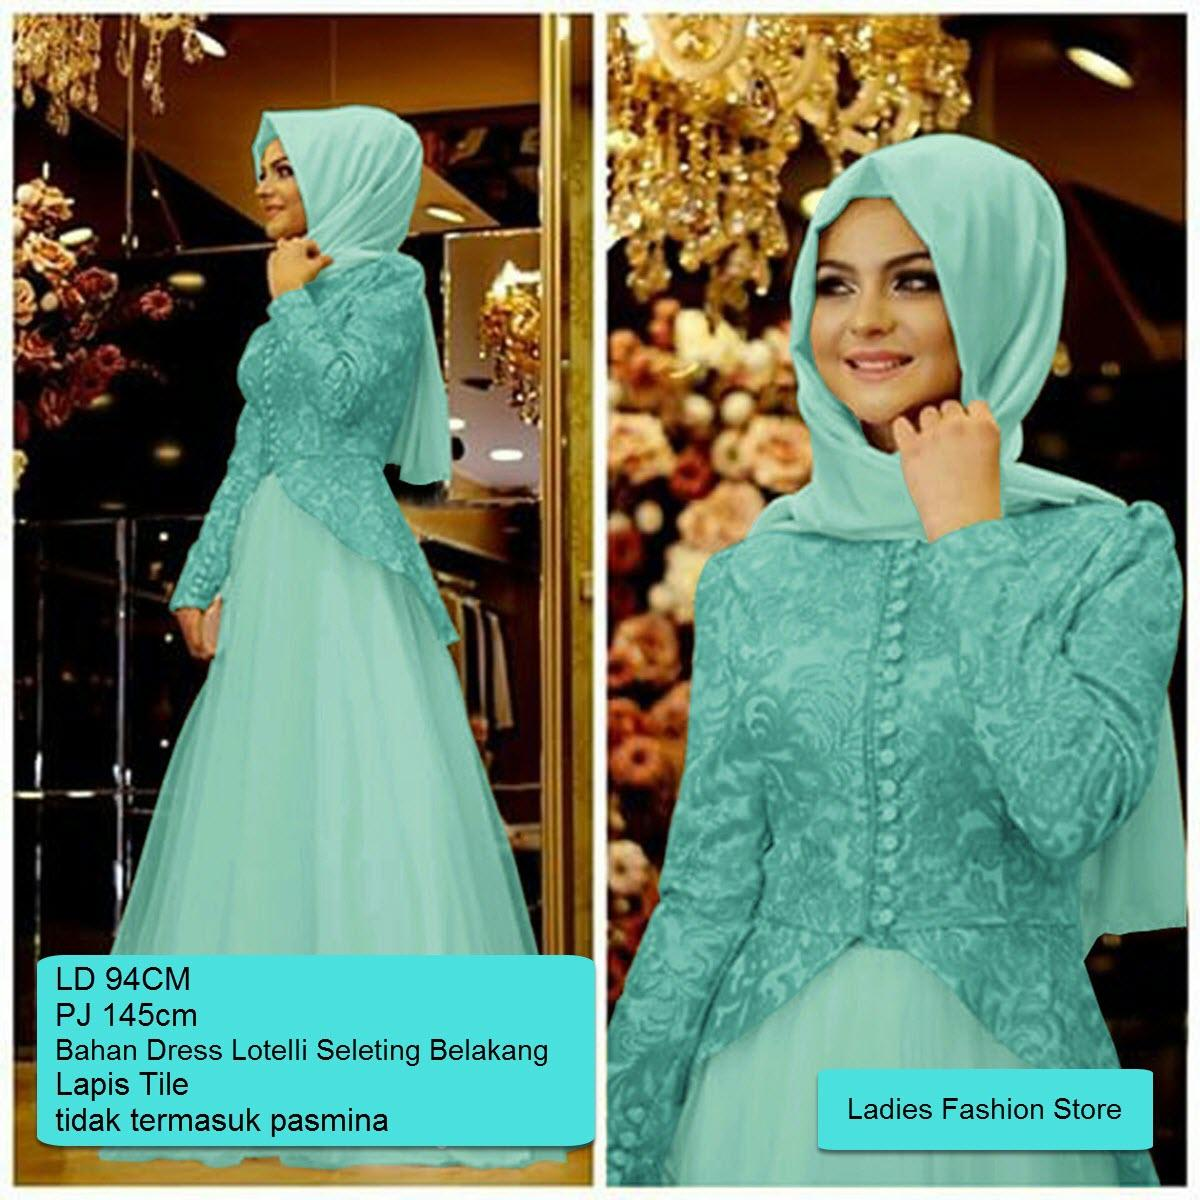 LF Dress Muslimah Panjang / Terusan Gamis Lebaran Terbaru 2018 / Setelan Gamis Wanita Murah dan Bagus / Gamis Syari Syar'i / Baju Muslim Murah / Dress Pesta Pernikahan / Pakaian Muslim Terkini / Hijab Wanita Model Baru / Gamis Cantik (lemasa) SS TOSCA